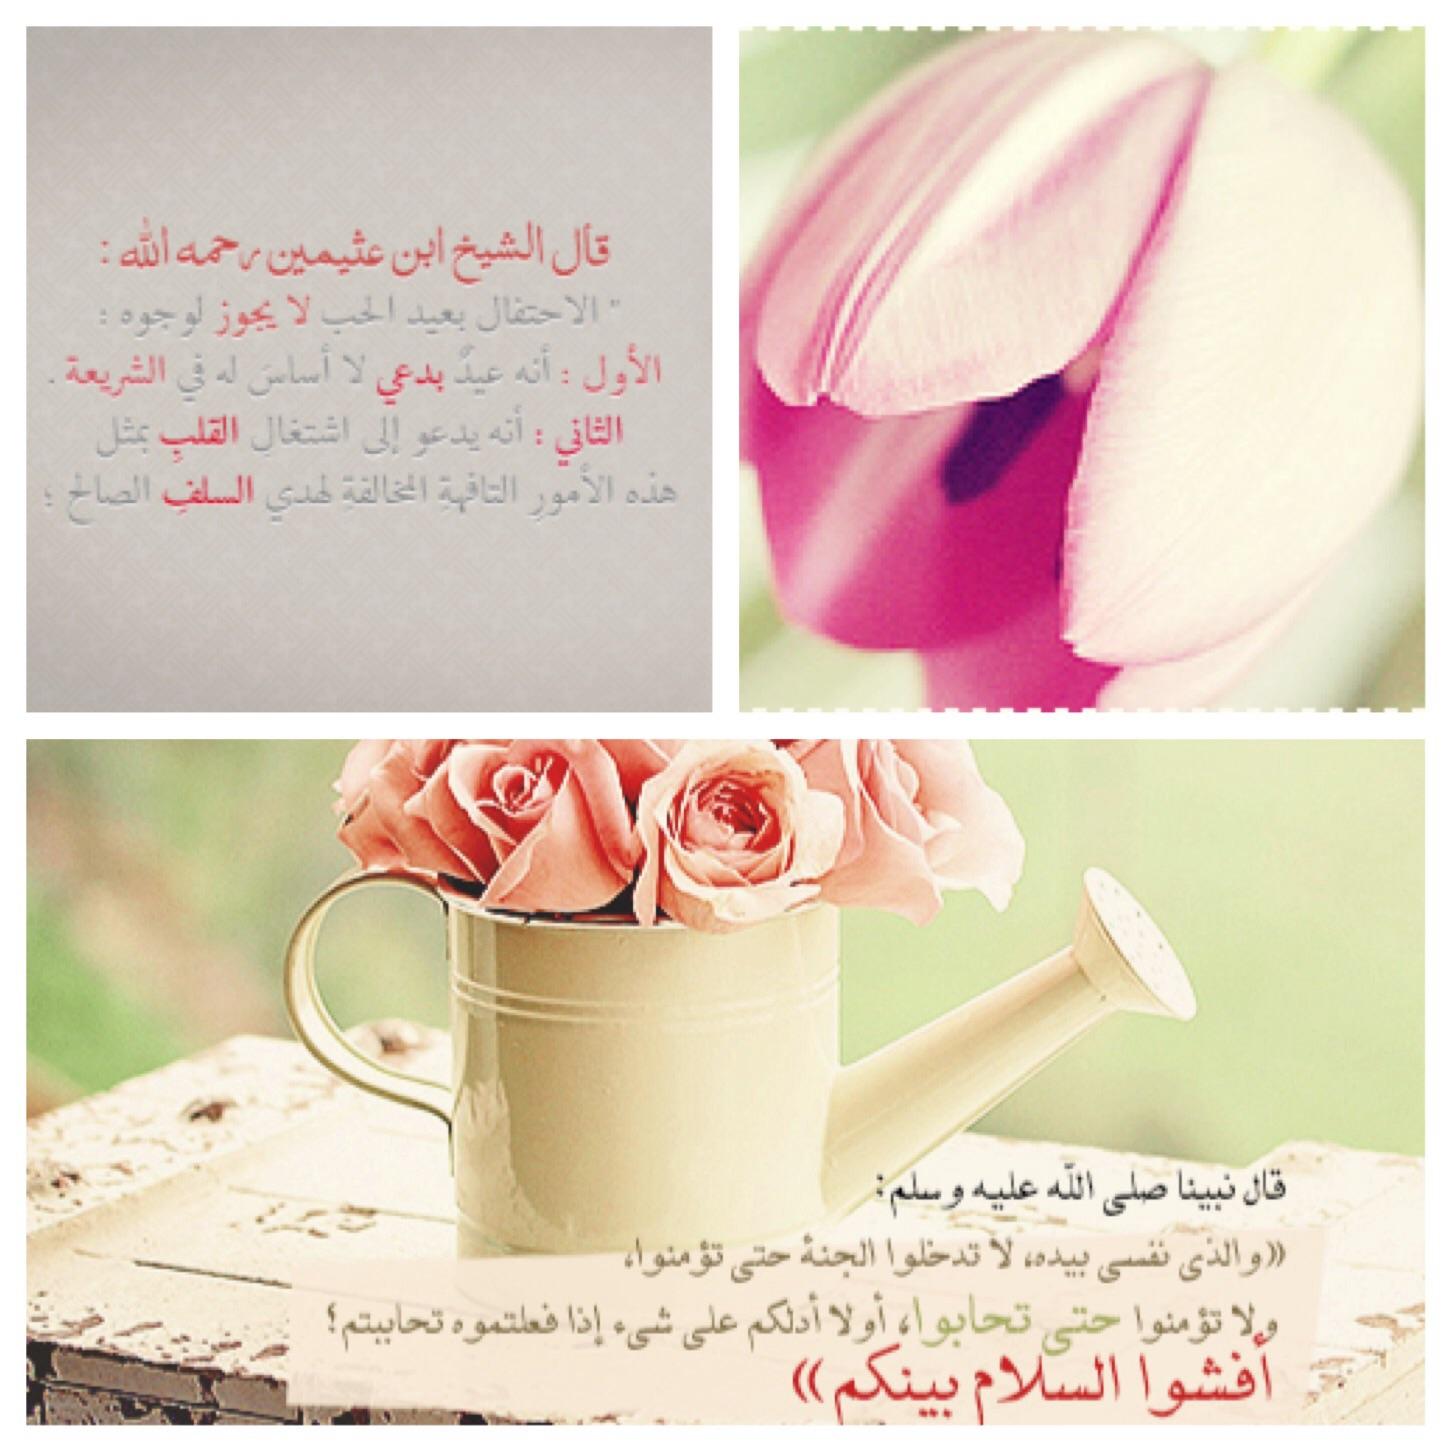 akhawat_islamway_1423848892__image.jpg